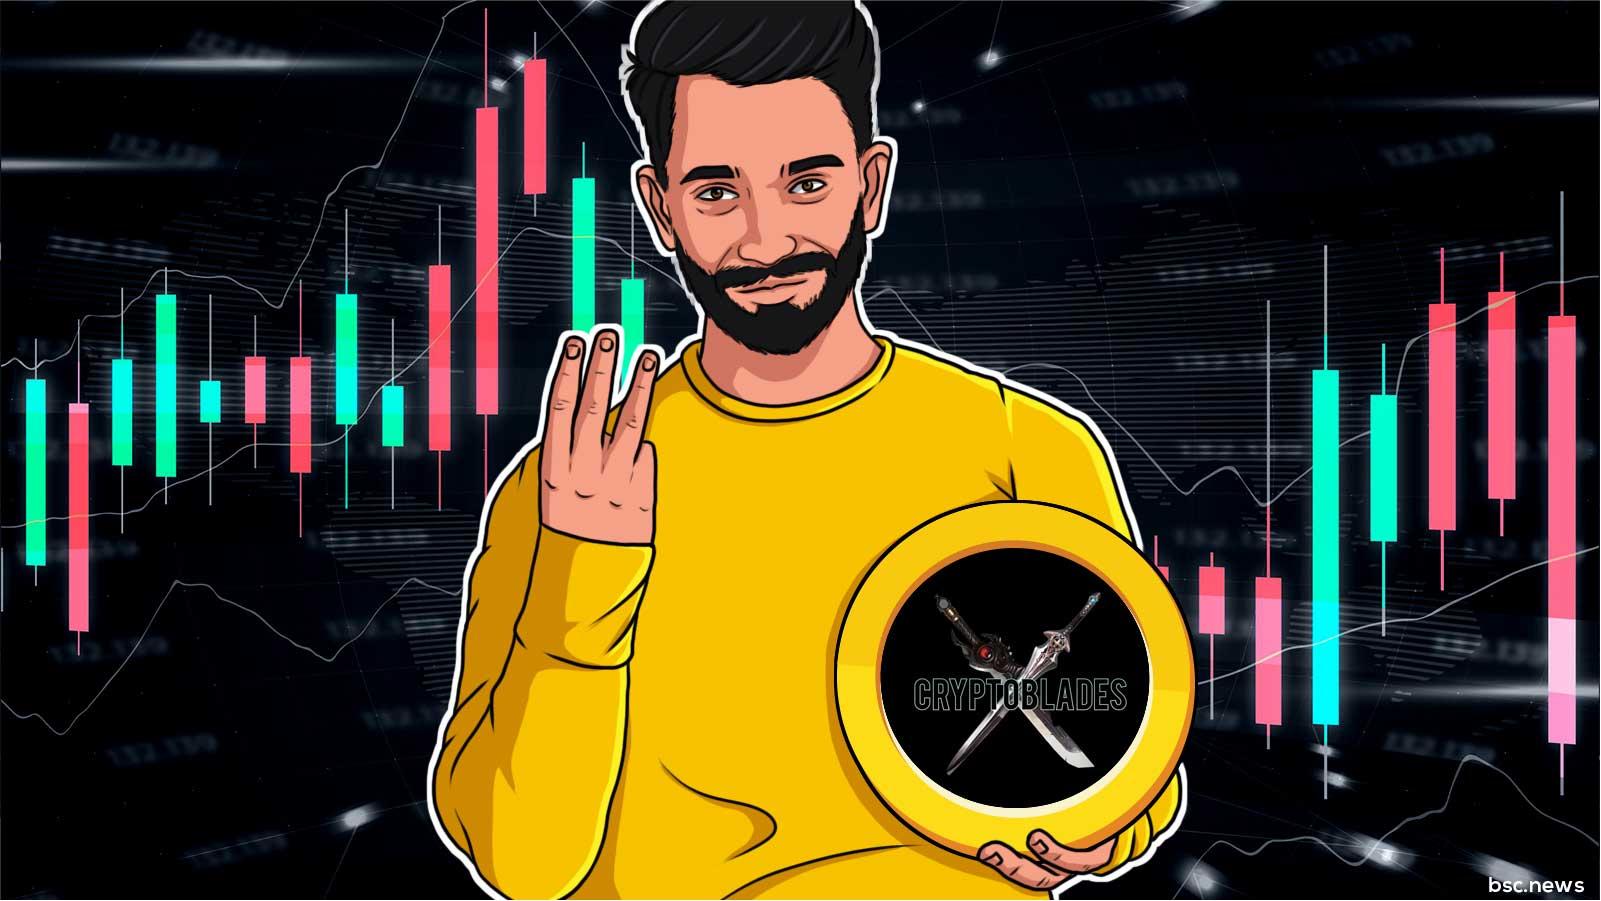 3 Reasons Why CryptoBlades $SKILL Token Corrected 70%+ Over 7 Days